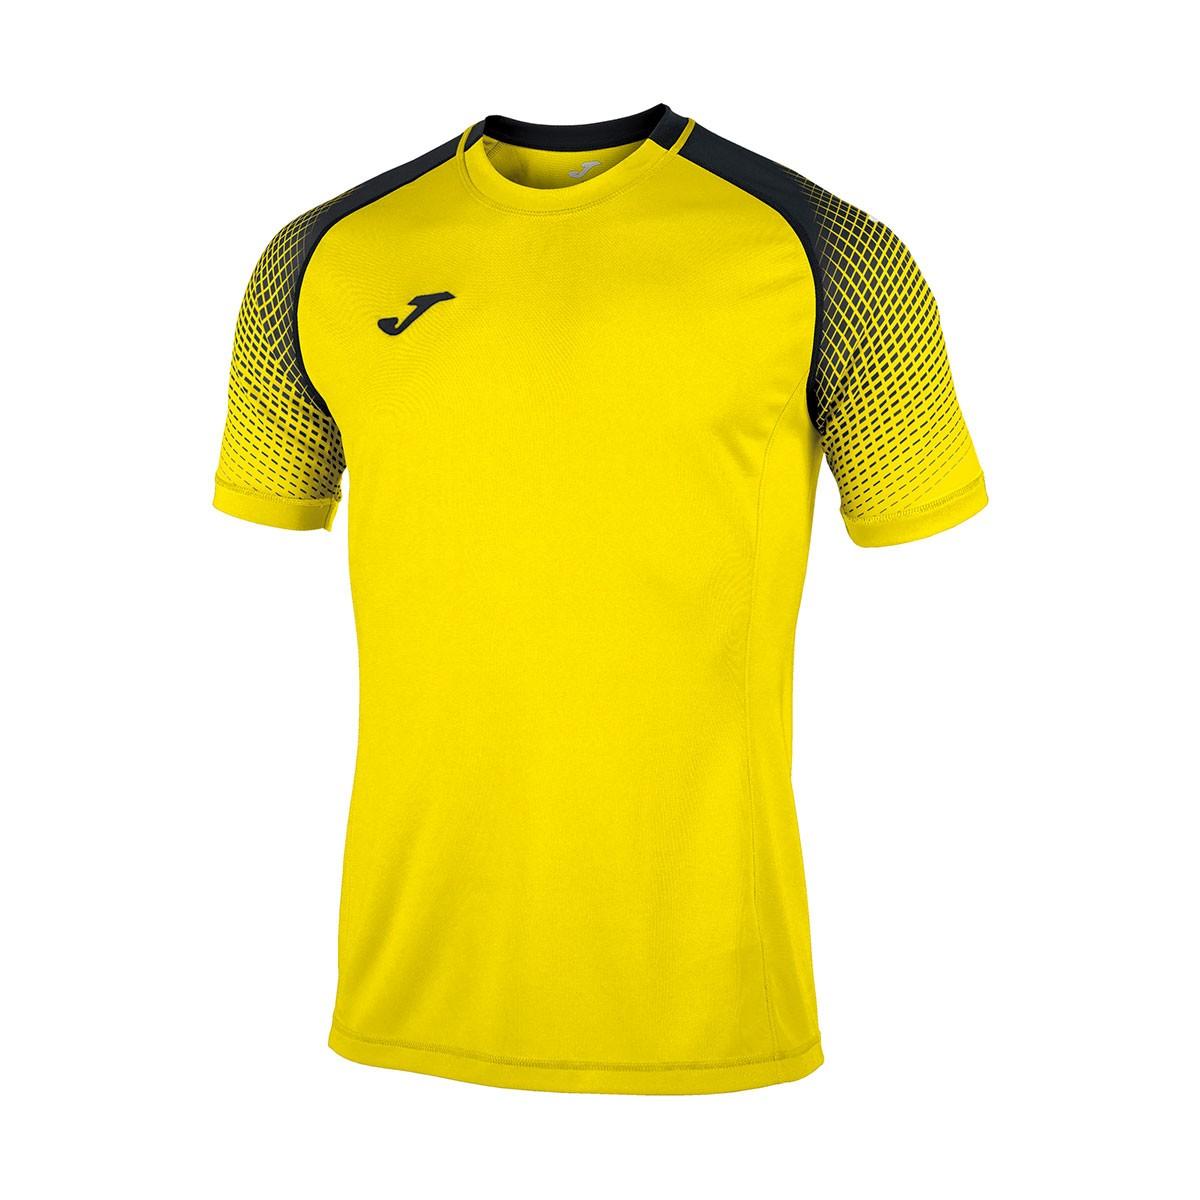 e37af10f2 Jersey Joma Hispa m c Yellow-Black - Football store Fútbol Emotion